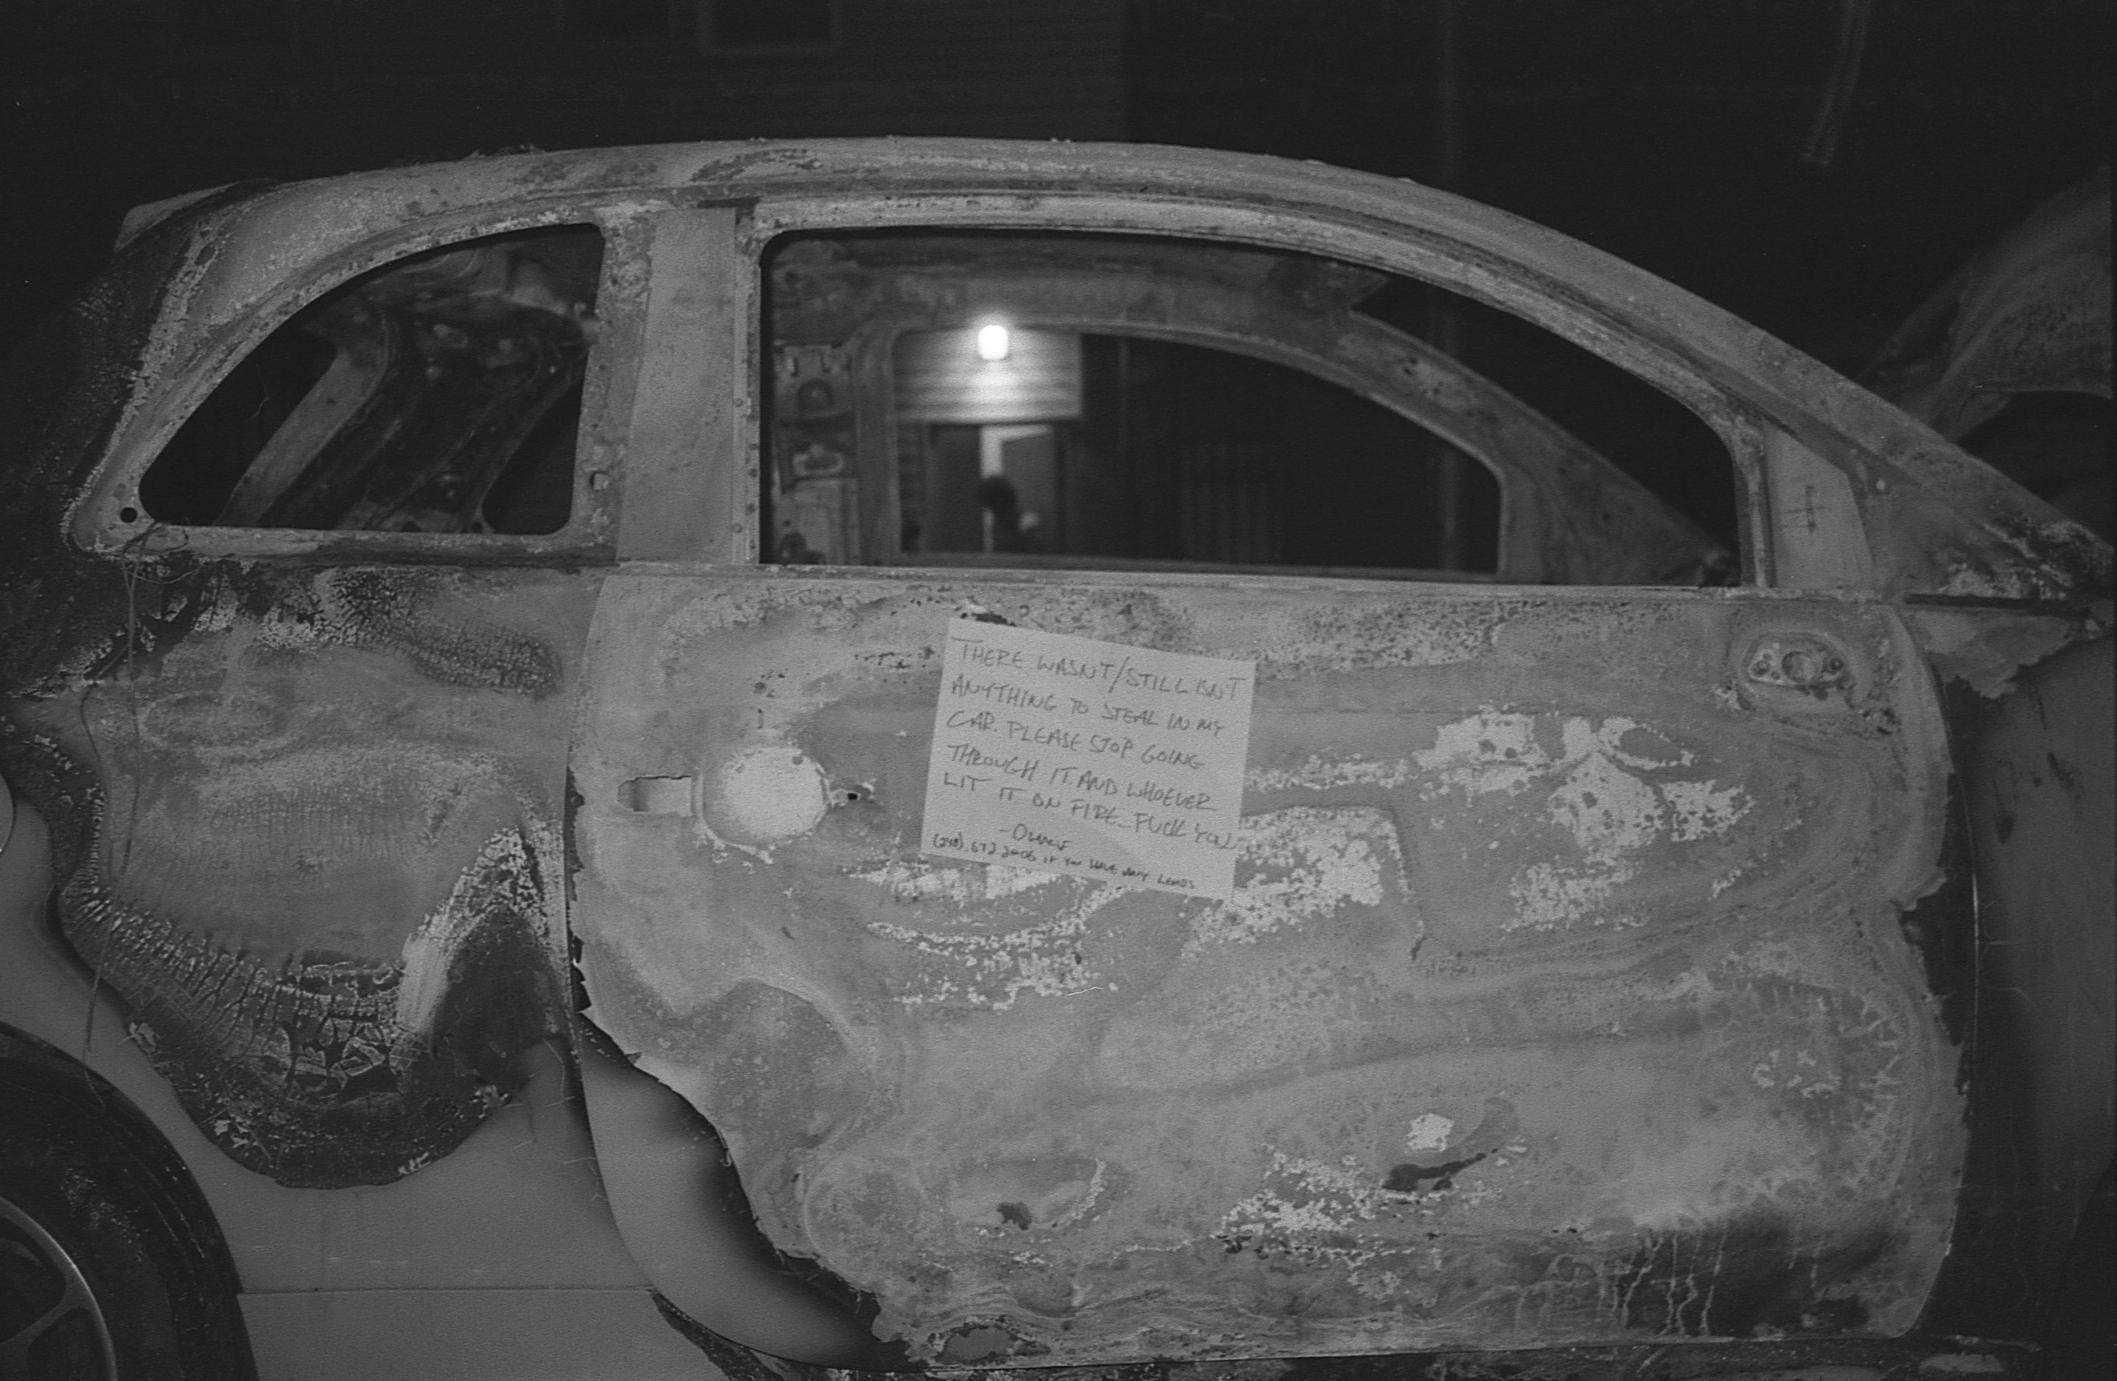 burnedoutcar.jpg